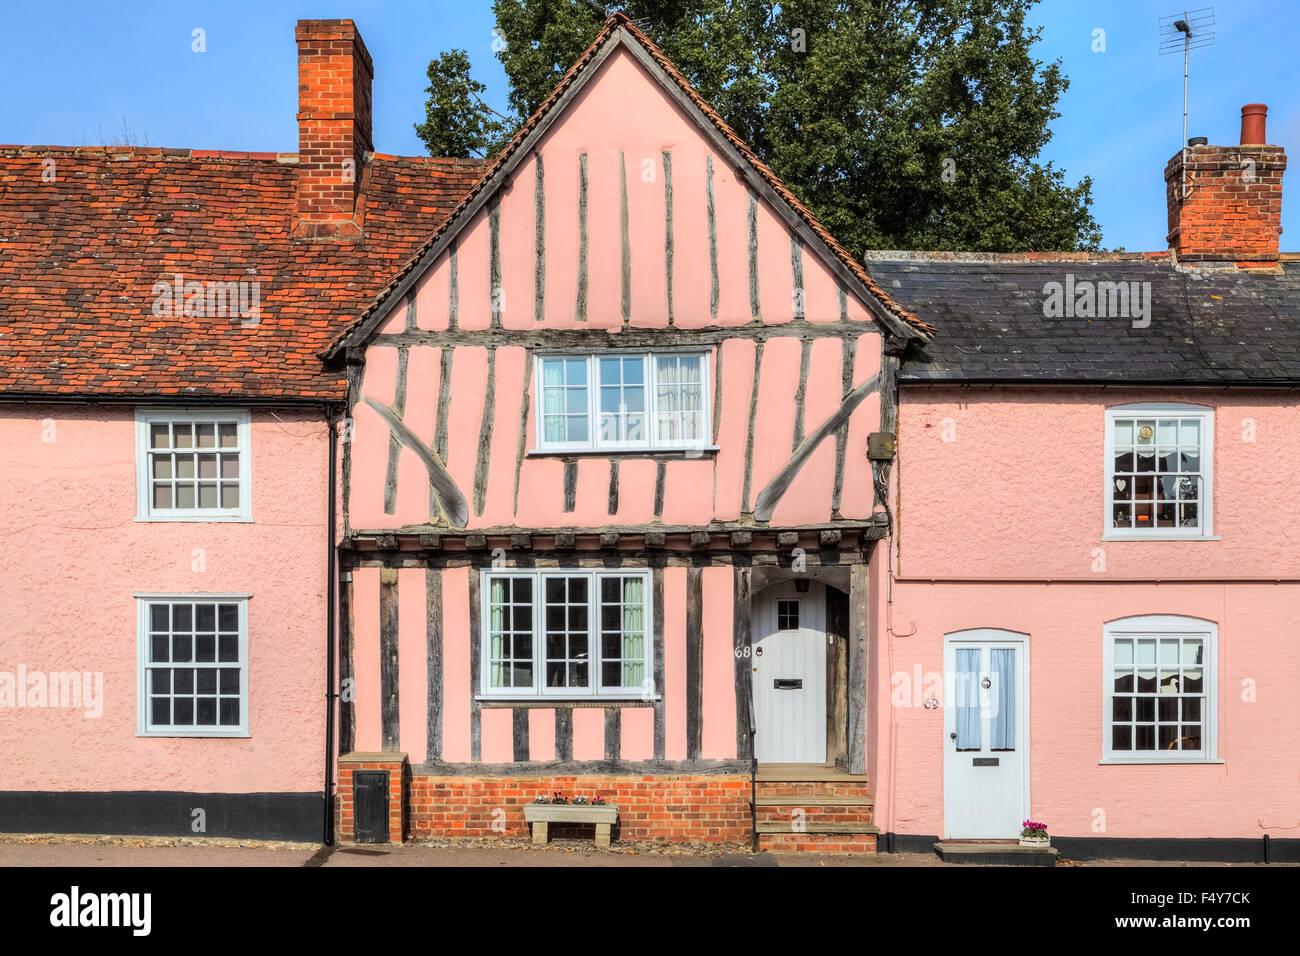 Lavenham, Suffolk, England, United Kingdom - Stock Image